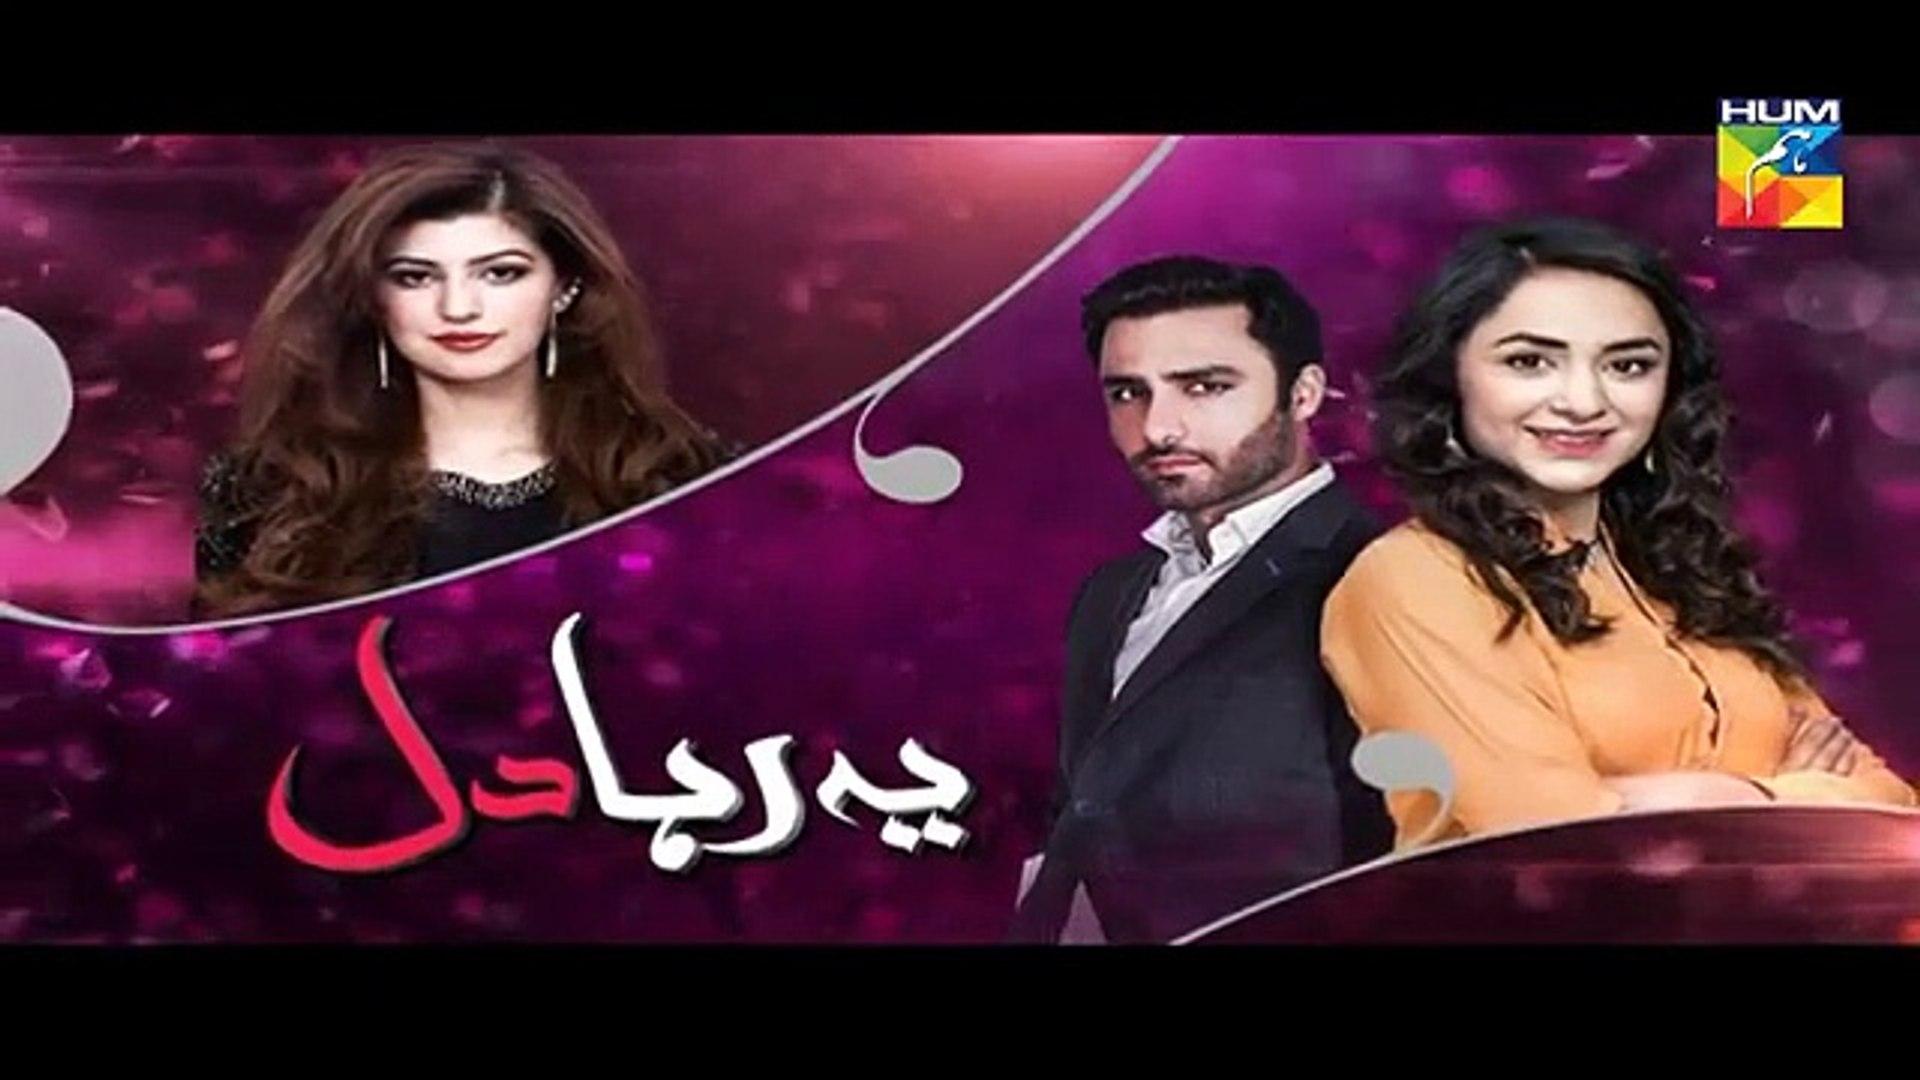 Yeh Raha Dil  Episode 13  Promo  Full HD Video  Hum TV Drama  1 May 2017